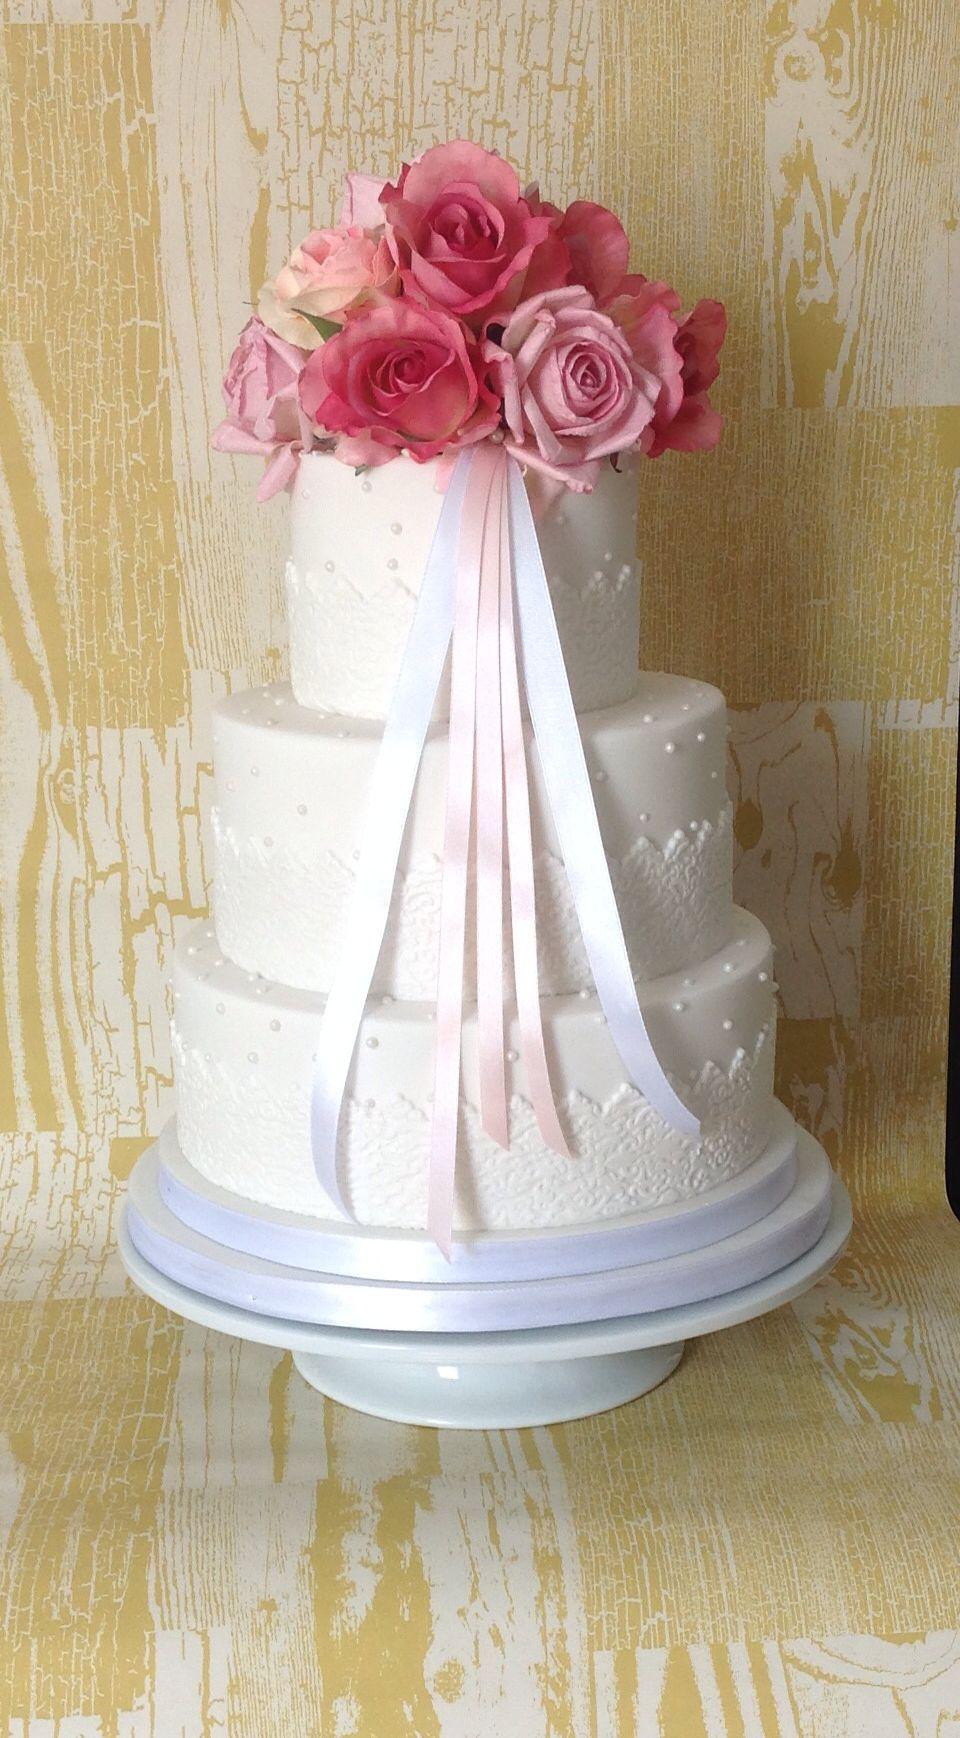 Simple Wedding Cake By Jemz Cake Box Jemz Cake Box Box Cake